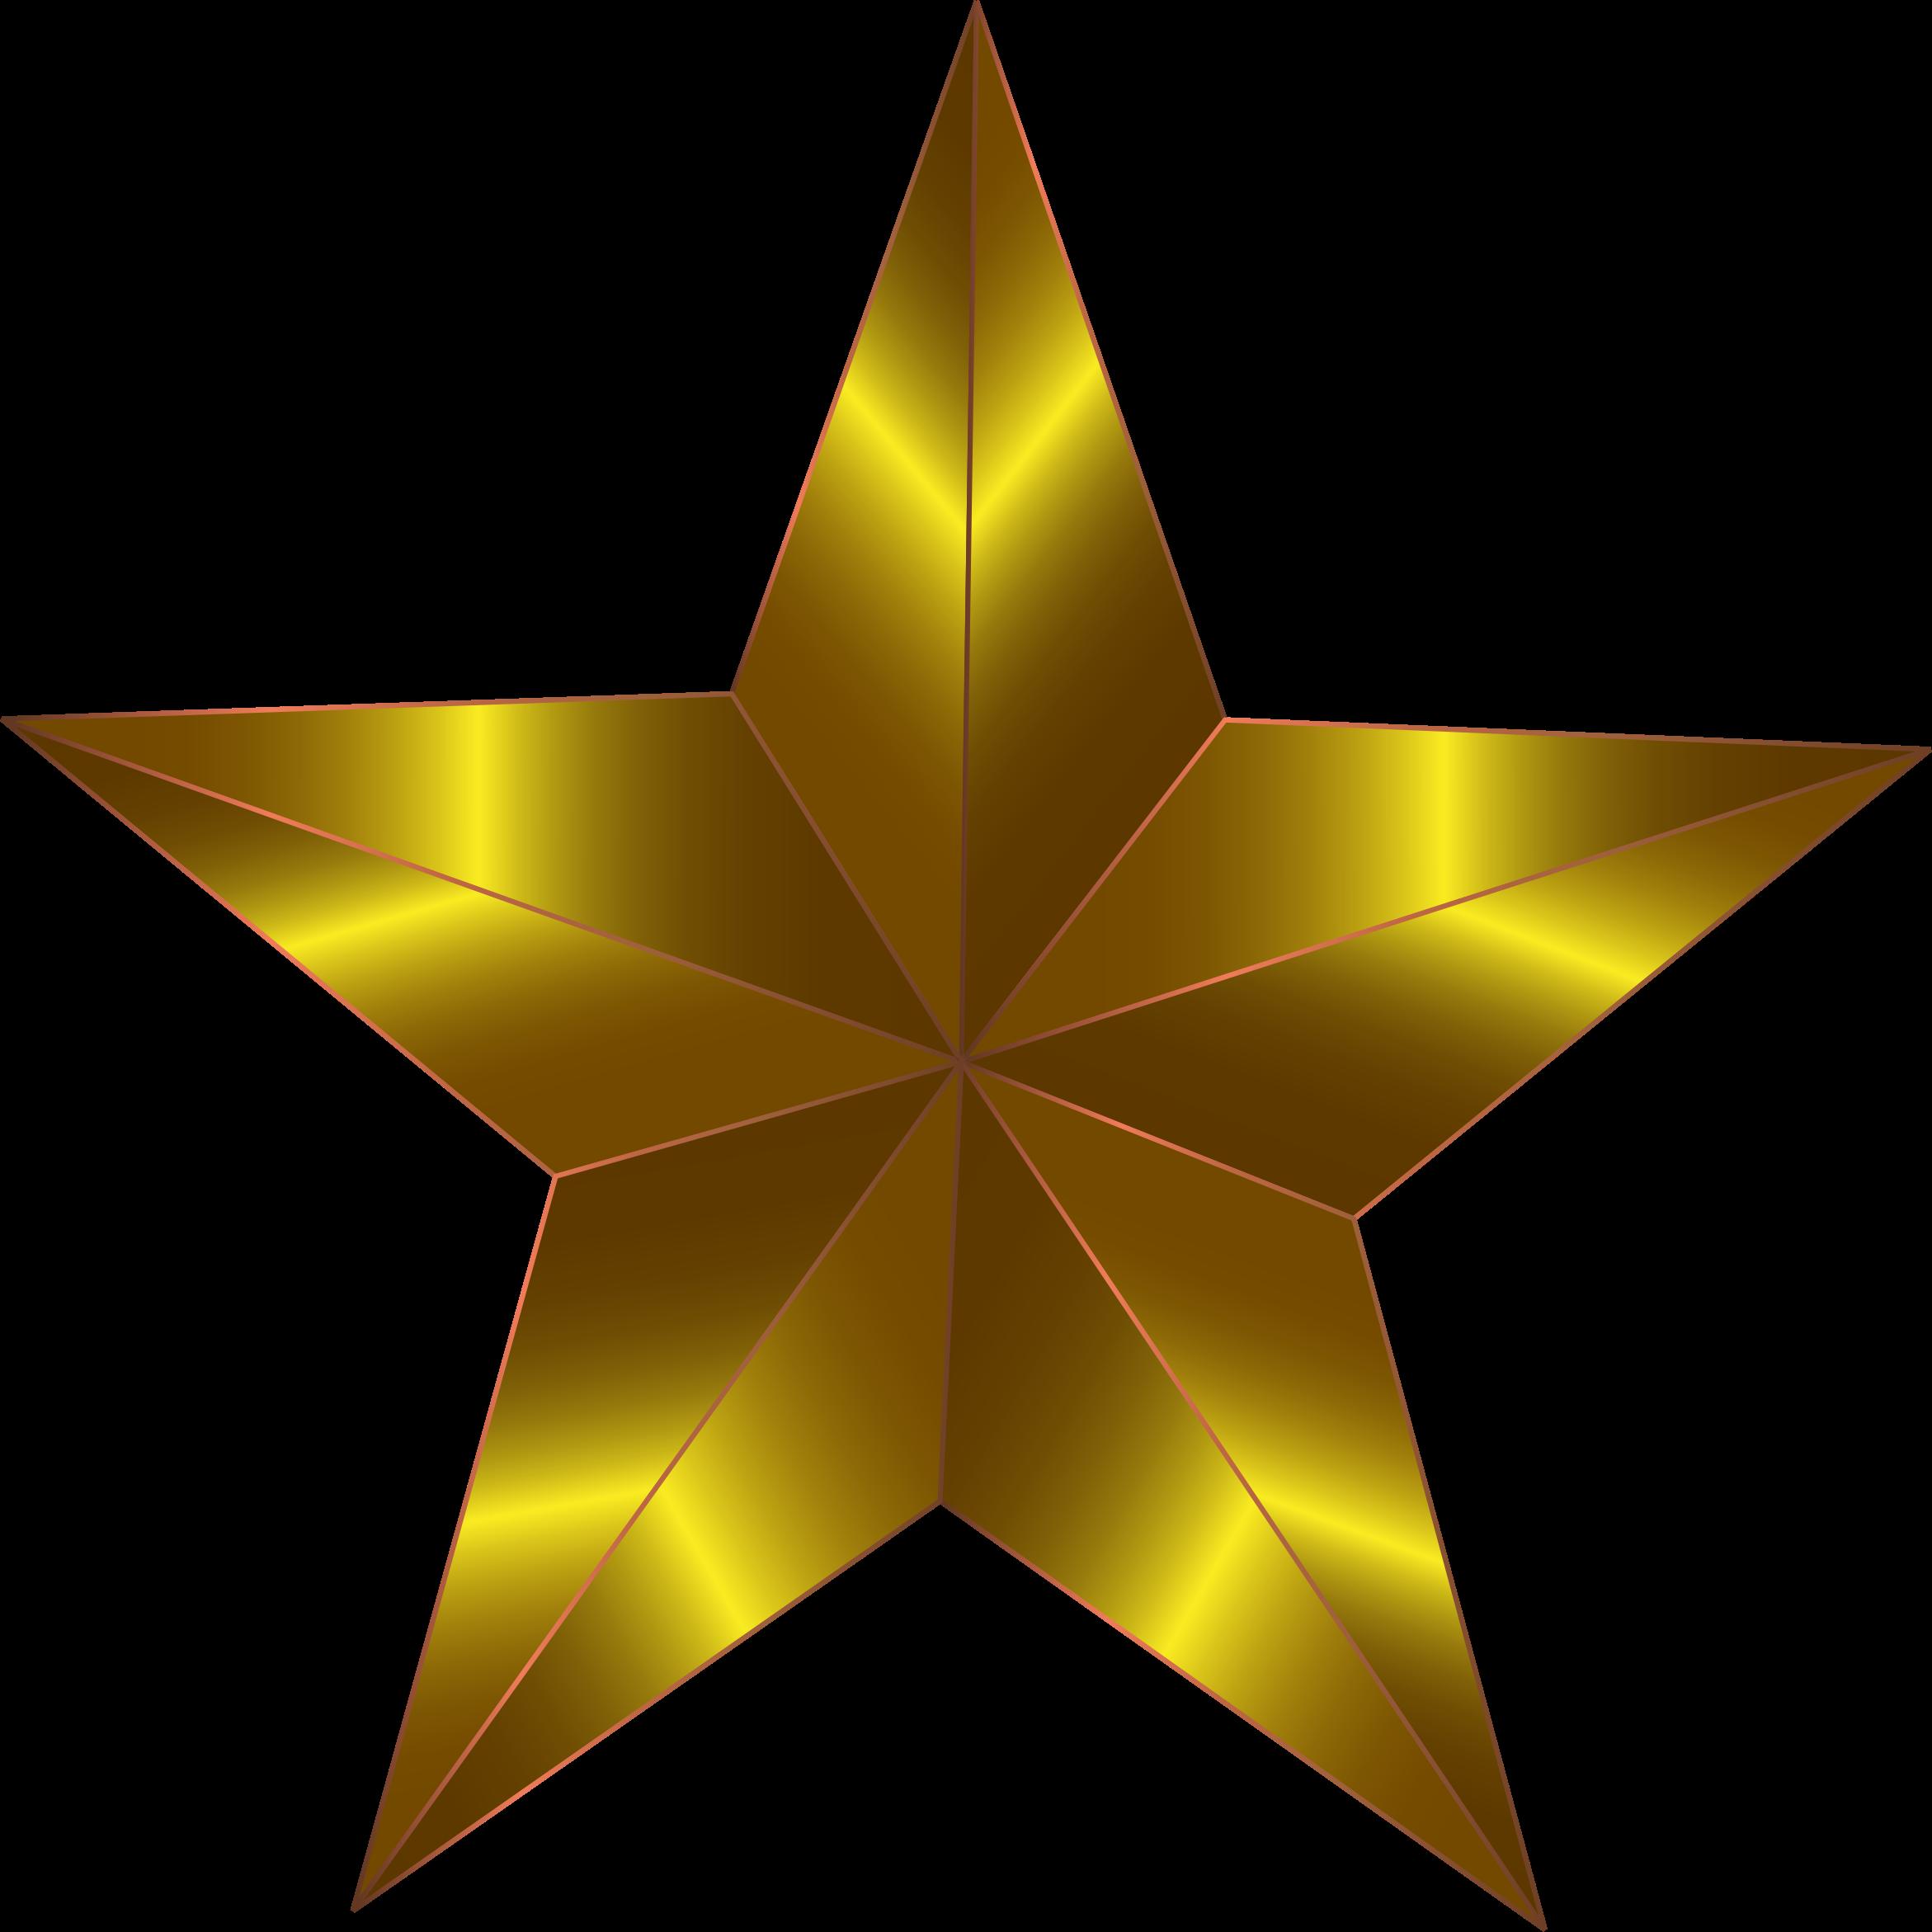 3d Gold Star Png File Png Mart